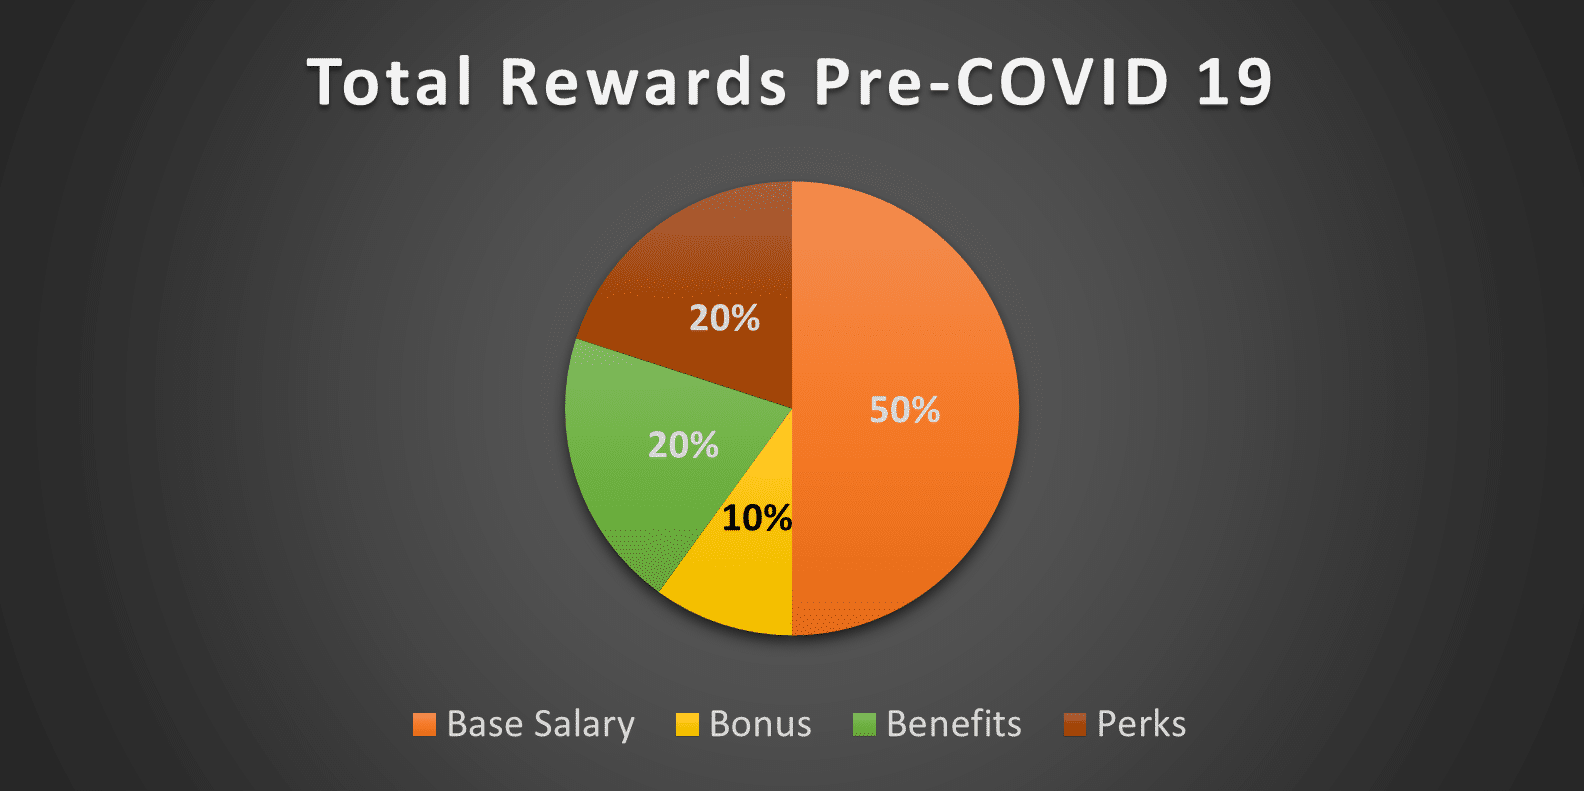 Human Resources | Total Rewards Mix | Fahrenheit Advisors